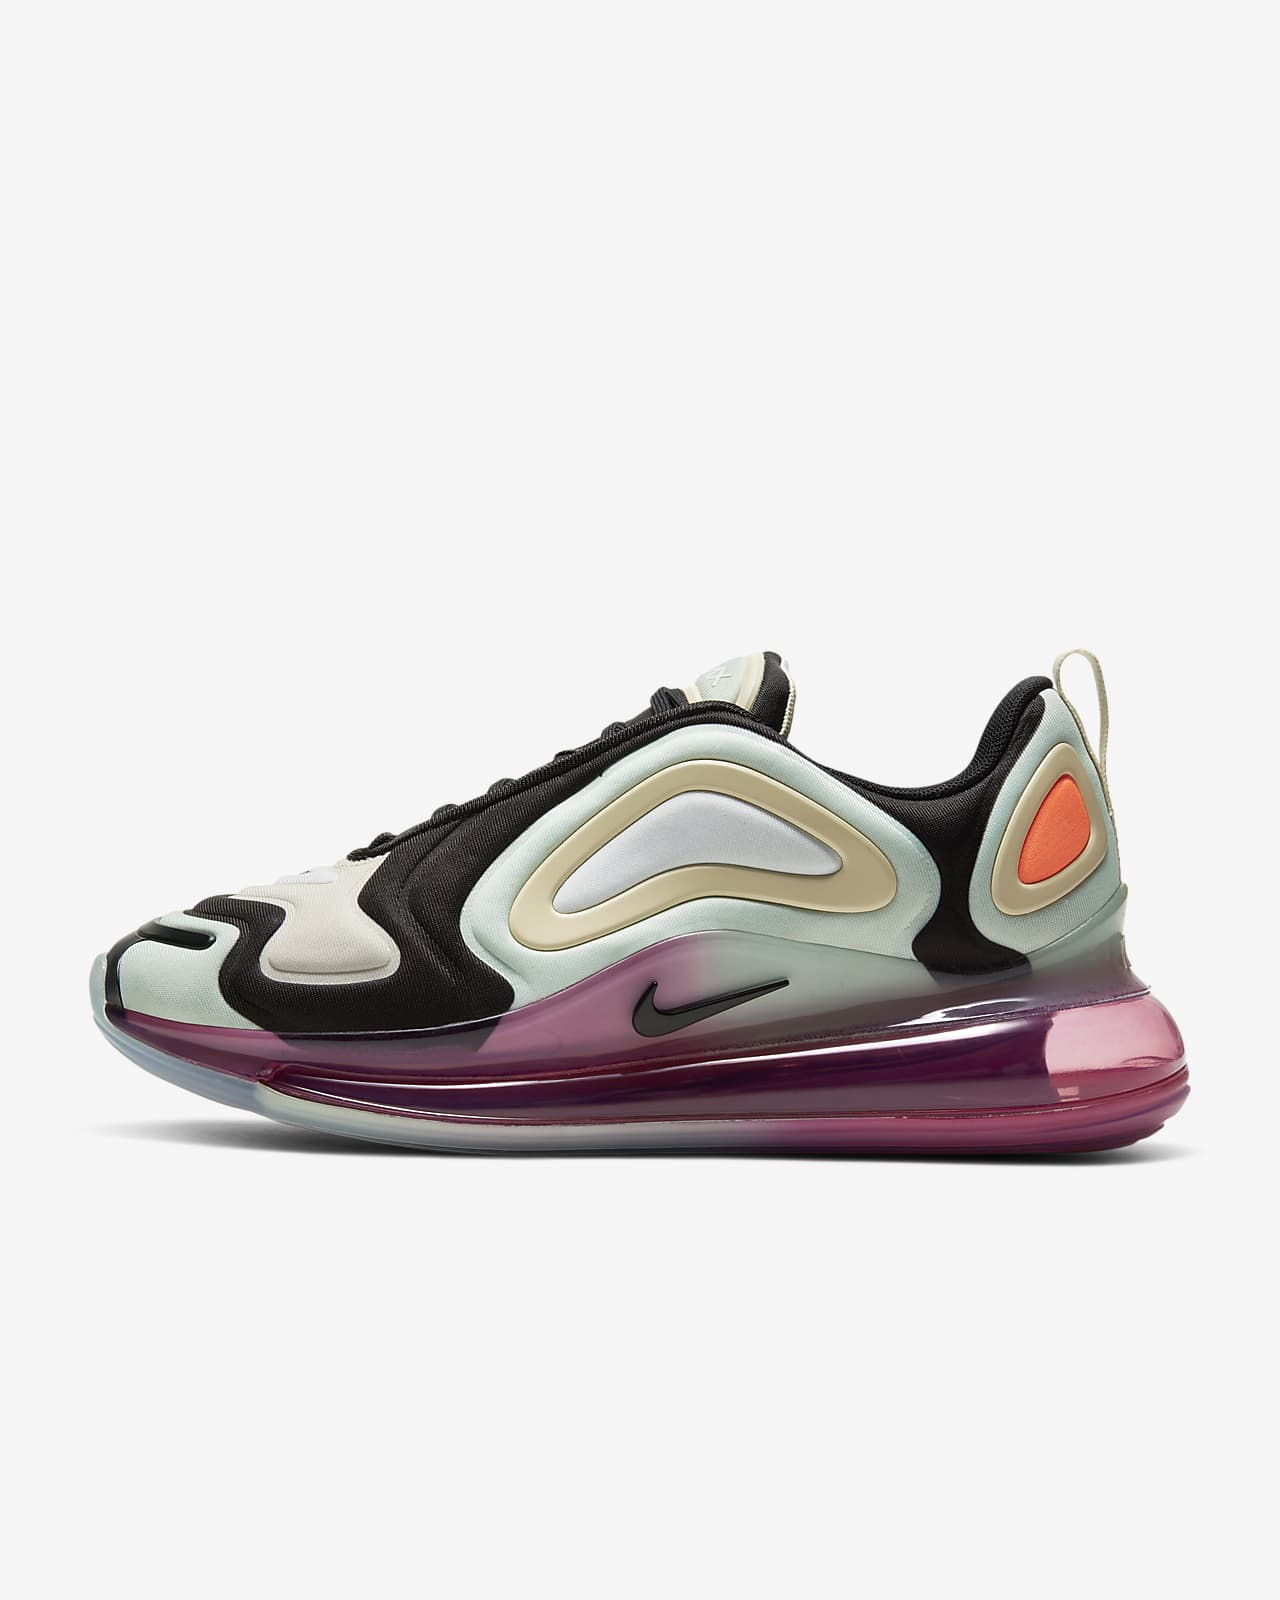 Nike Air Max 720 女子运动鞋